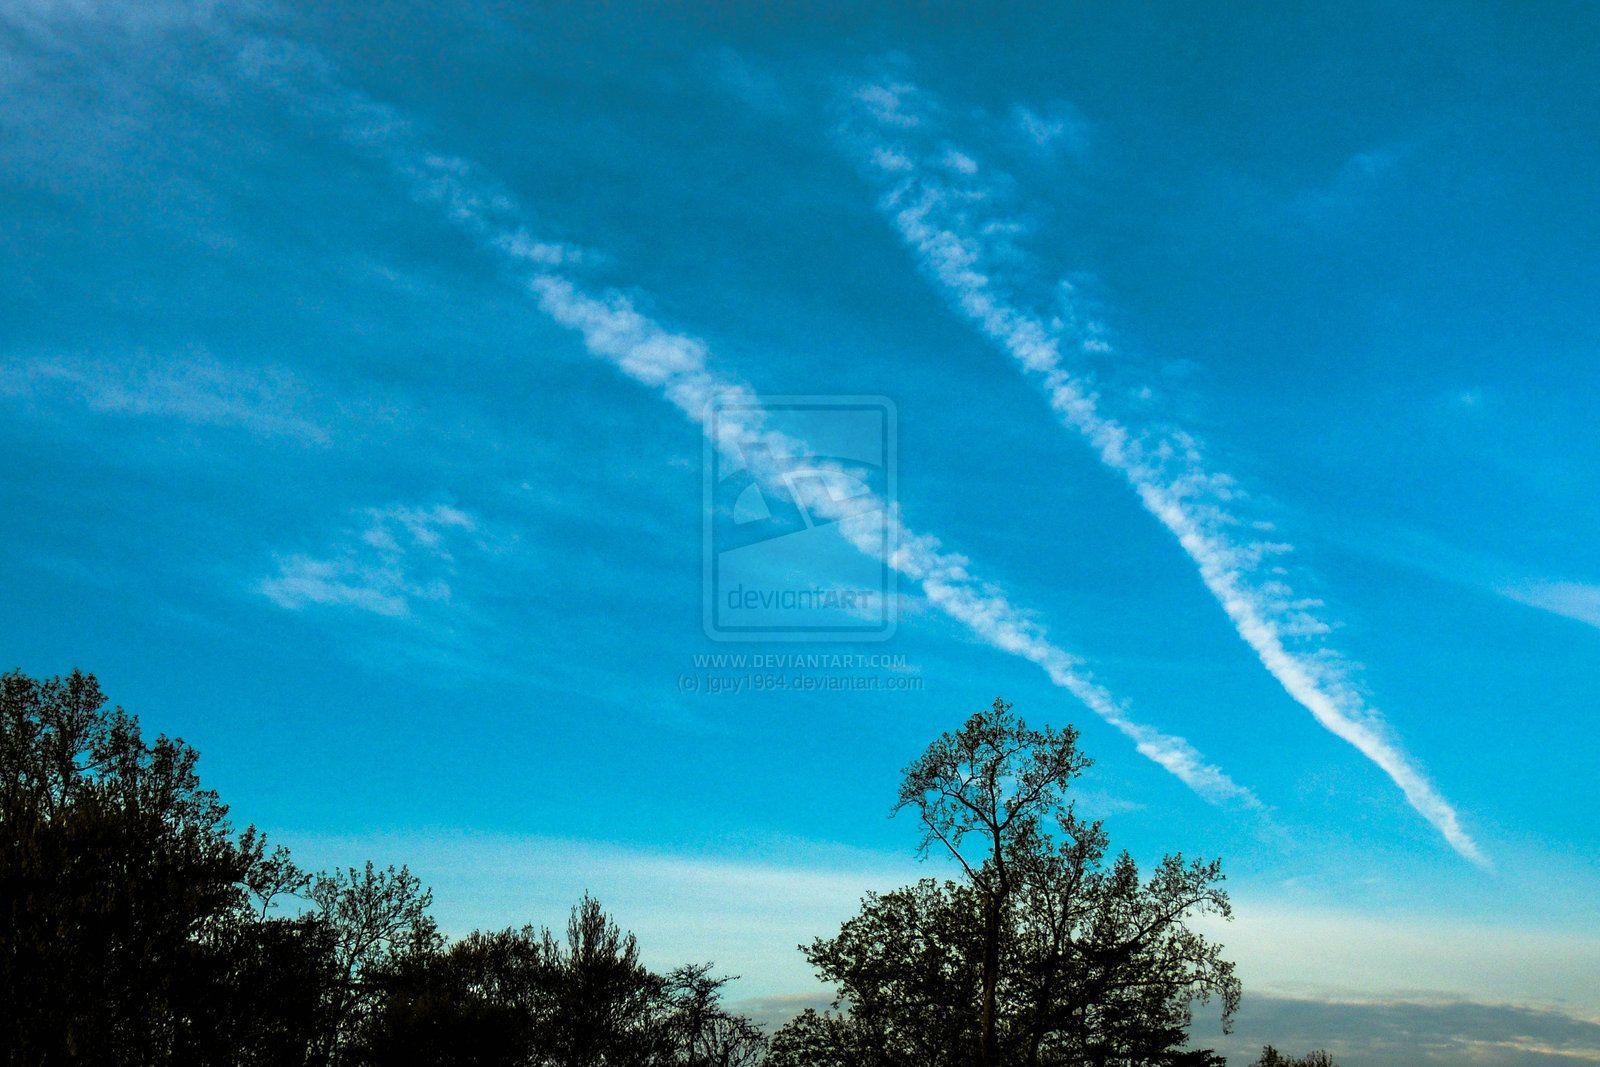 Project 365 - 107 - The Sky Burnout by jguy1964.deviantart.com on @deviantART